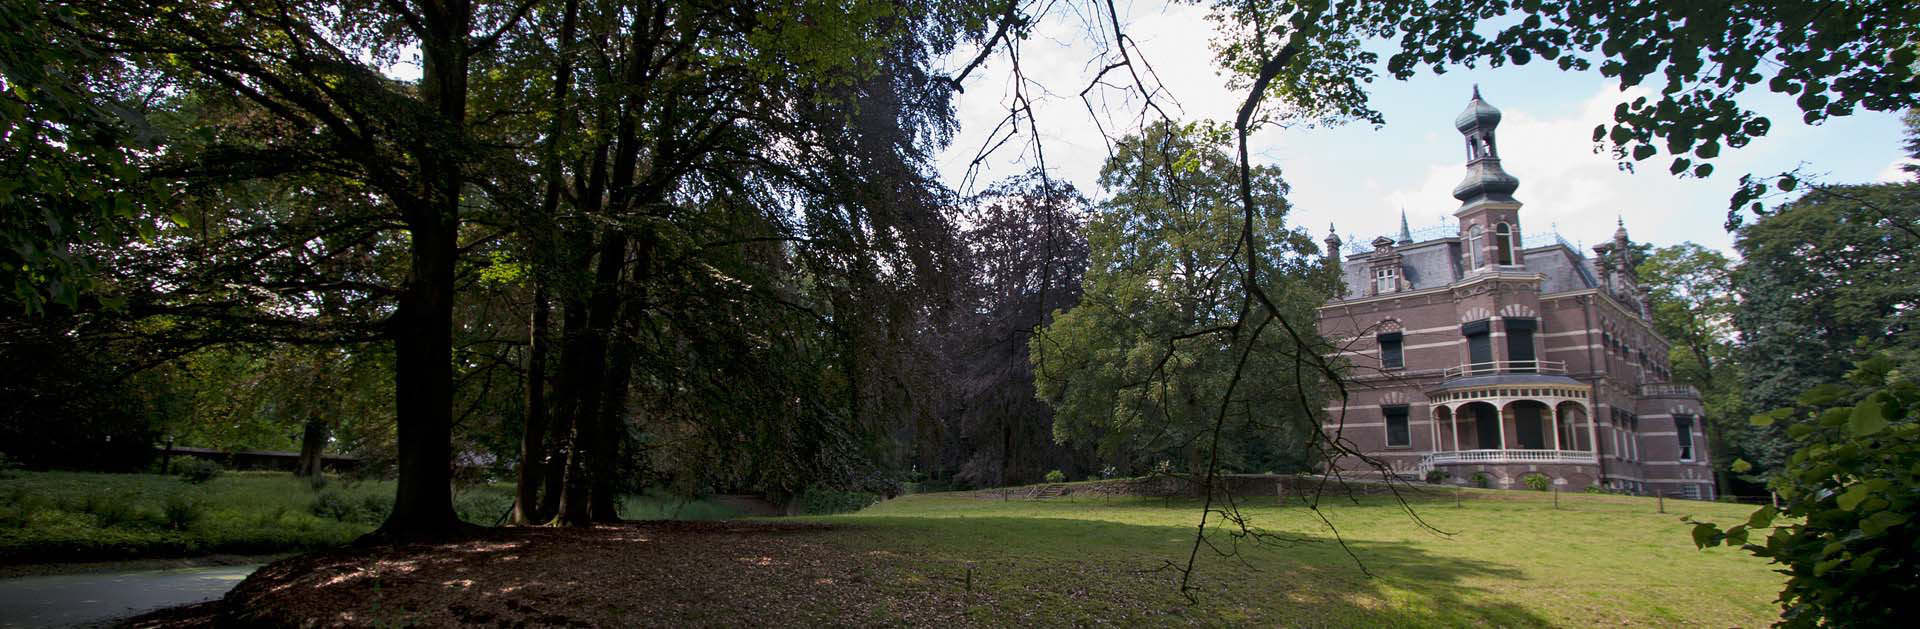 Huize 't Suideras - Vierakker Regio Achterhoek - Liemers